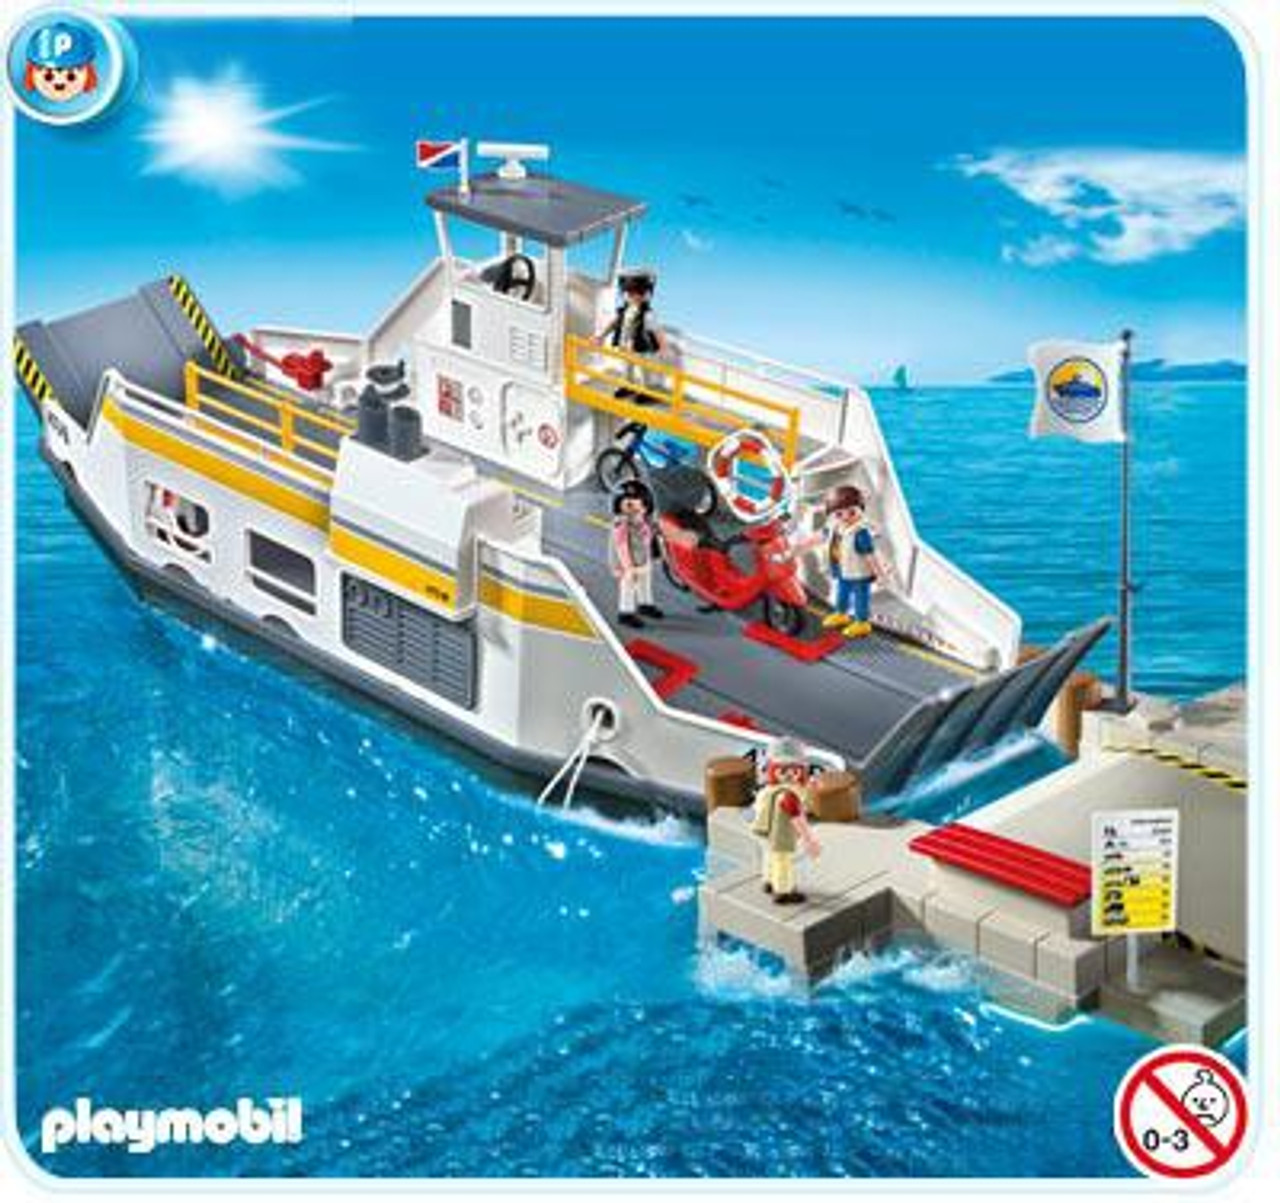 Playmobil Harbor Car Ferry with Pier Set #5127